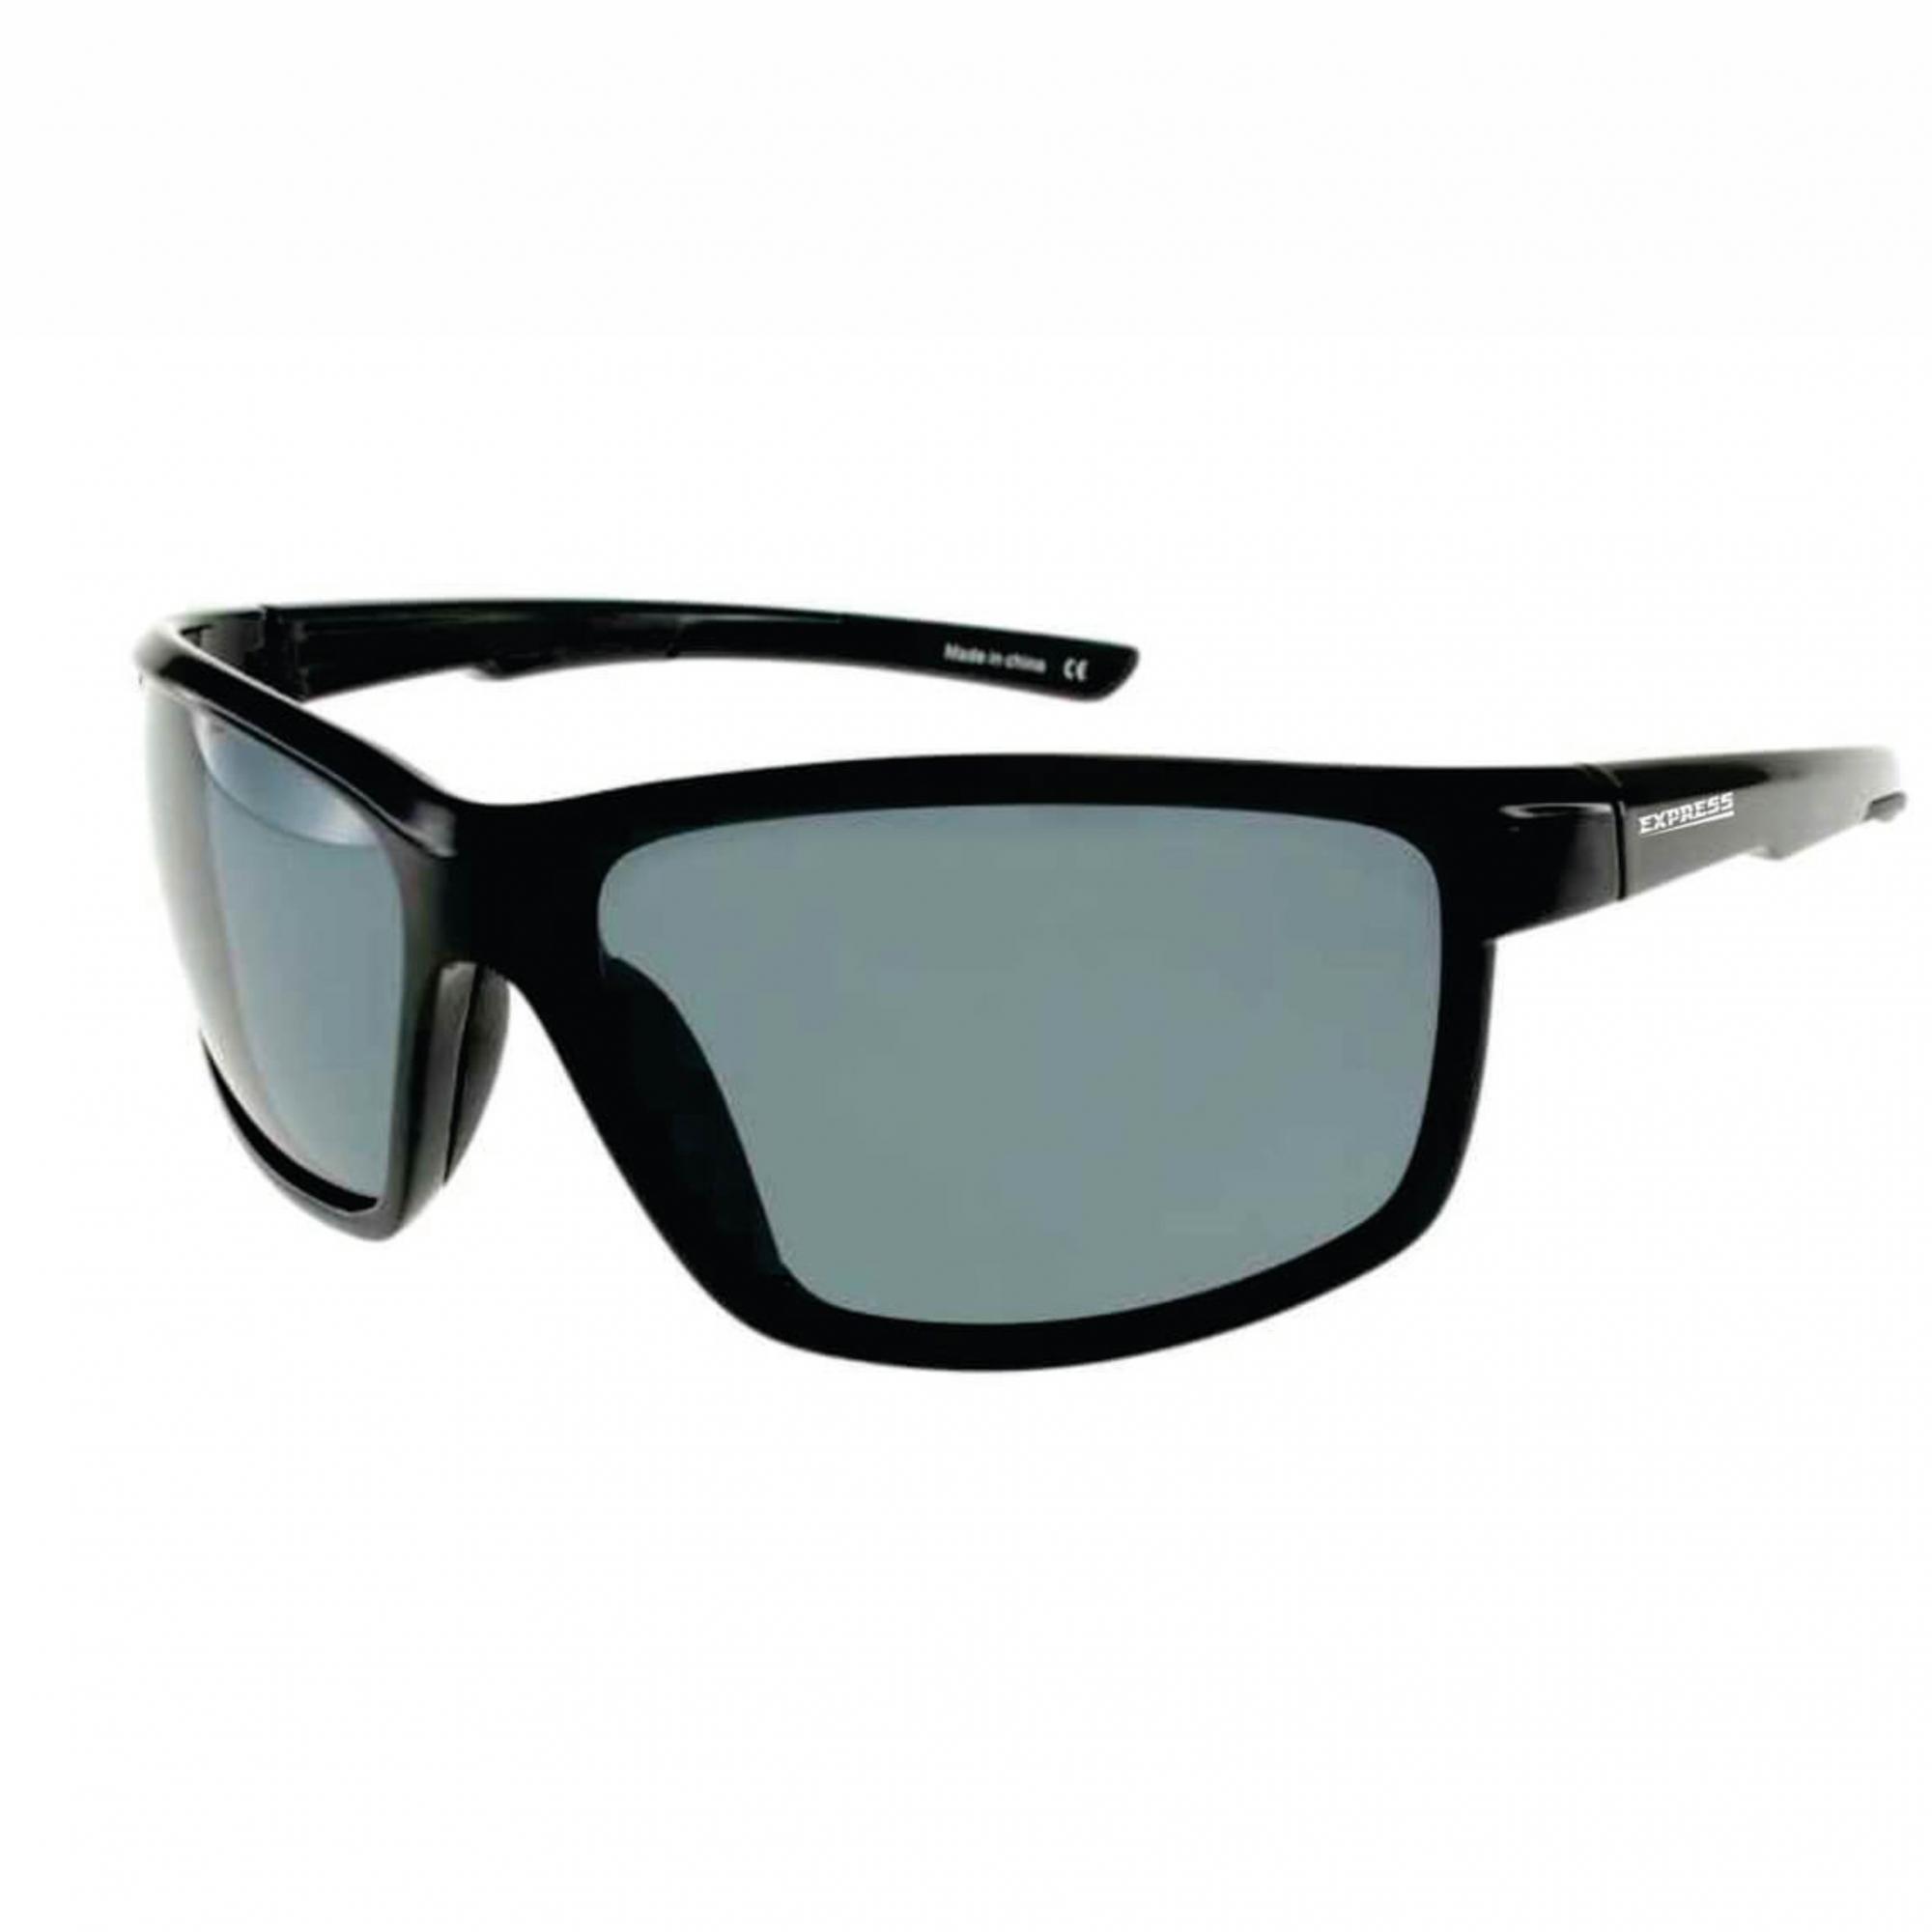 Óculos de Sol Polarizado Express Pescada Preto